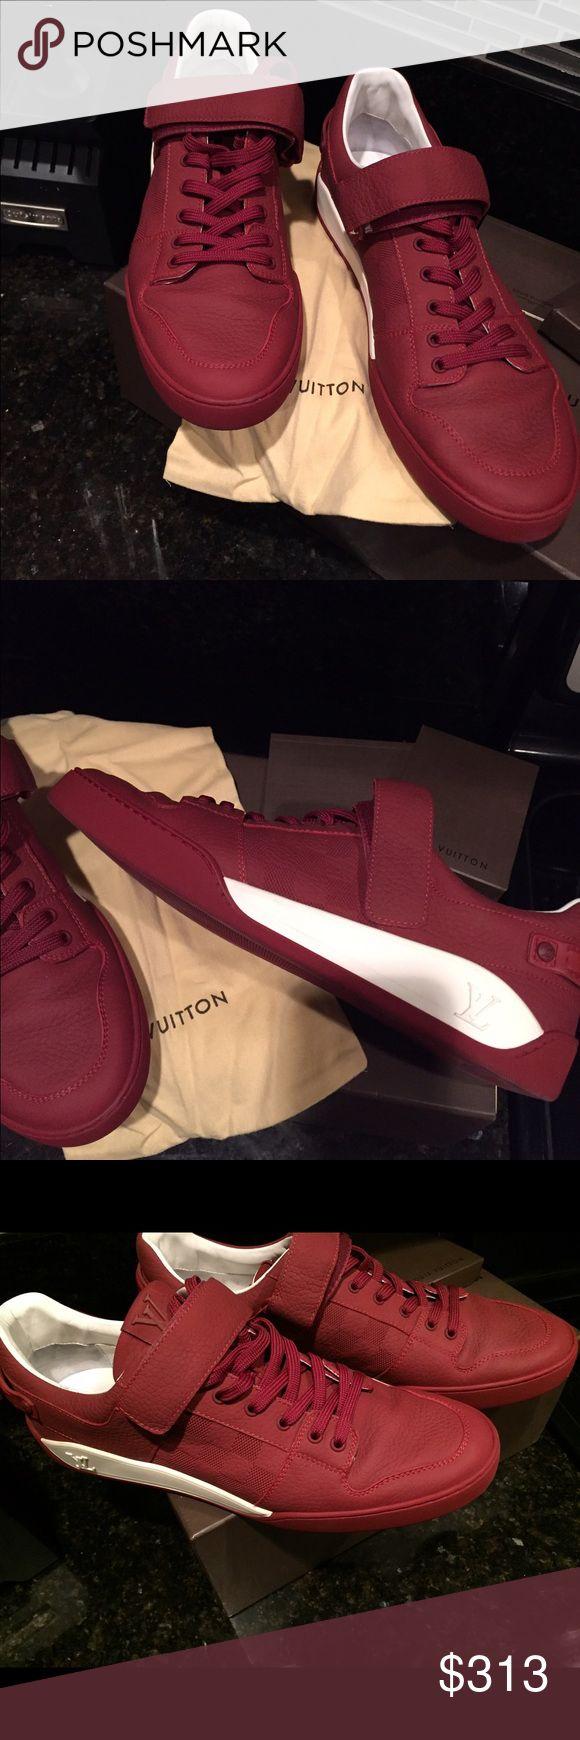 Authentic Men Louis Vuitton Sneakers Authentic Men Louis Vuitton  Men Sneakers Louis Vuitton Shoes Sneakers